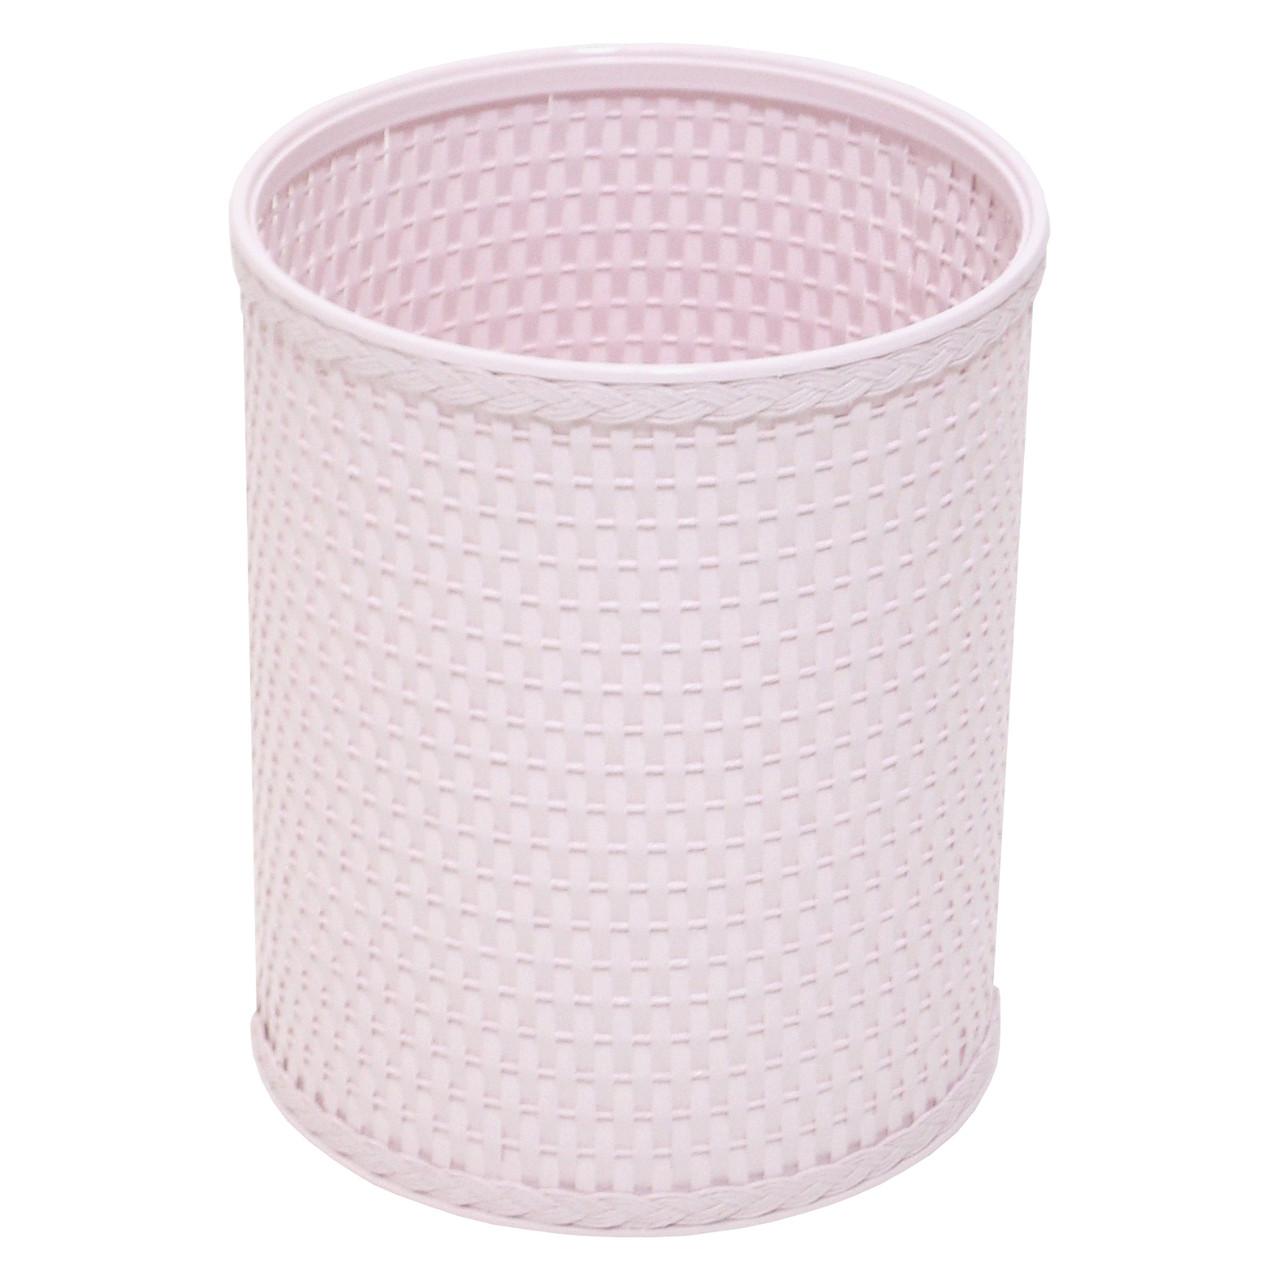 Chelsea Wicker Round Wastebasket Crystal Pink